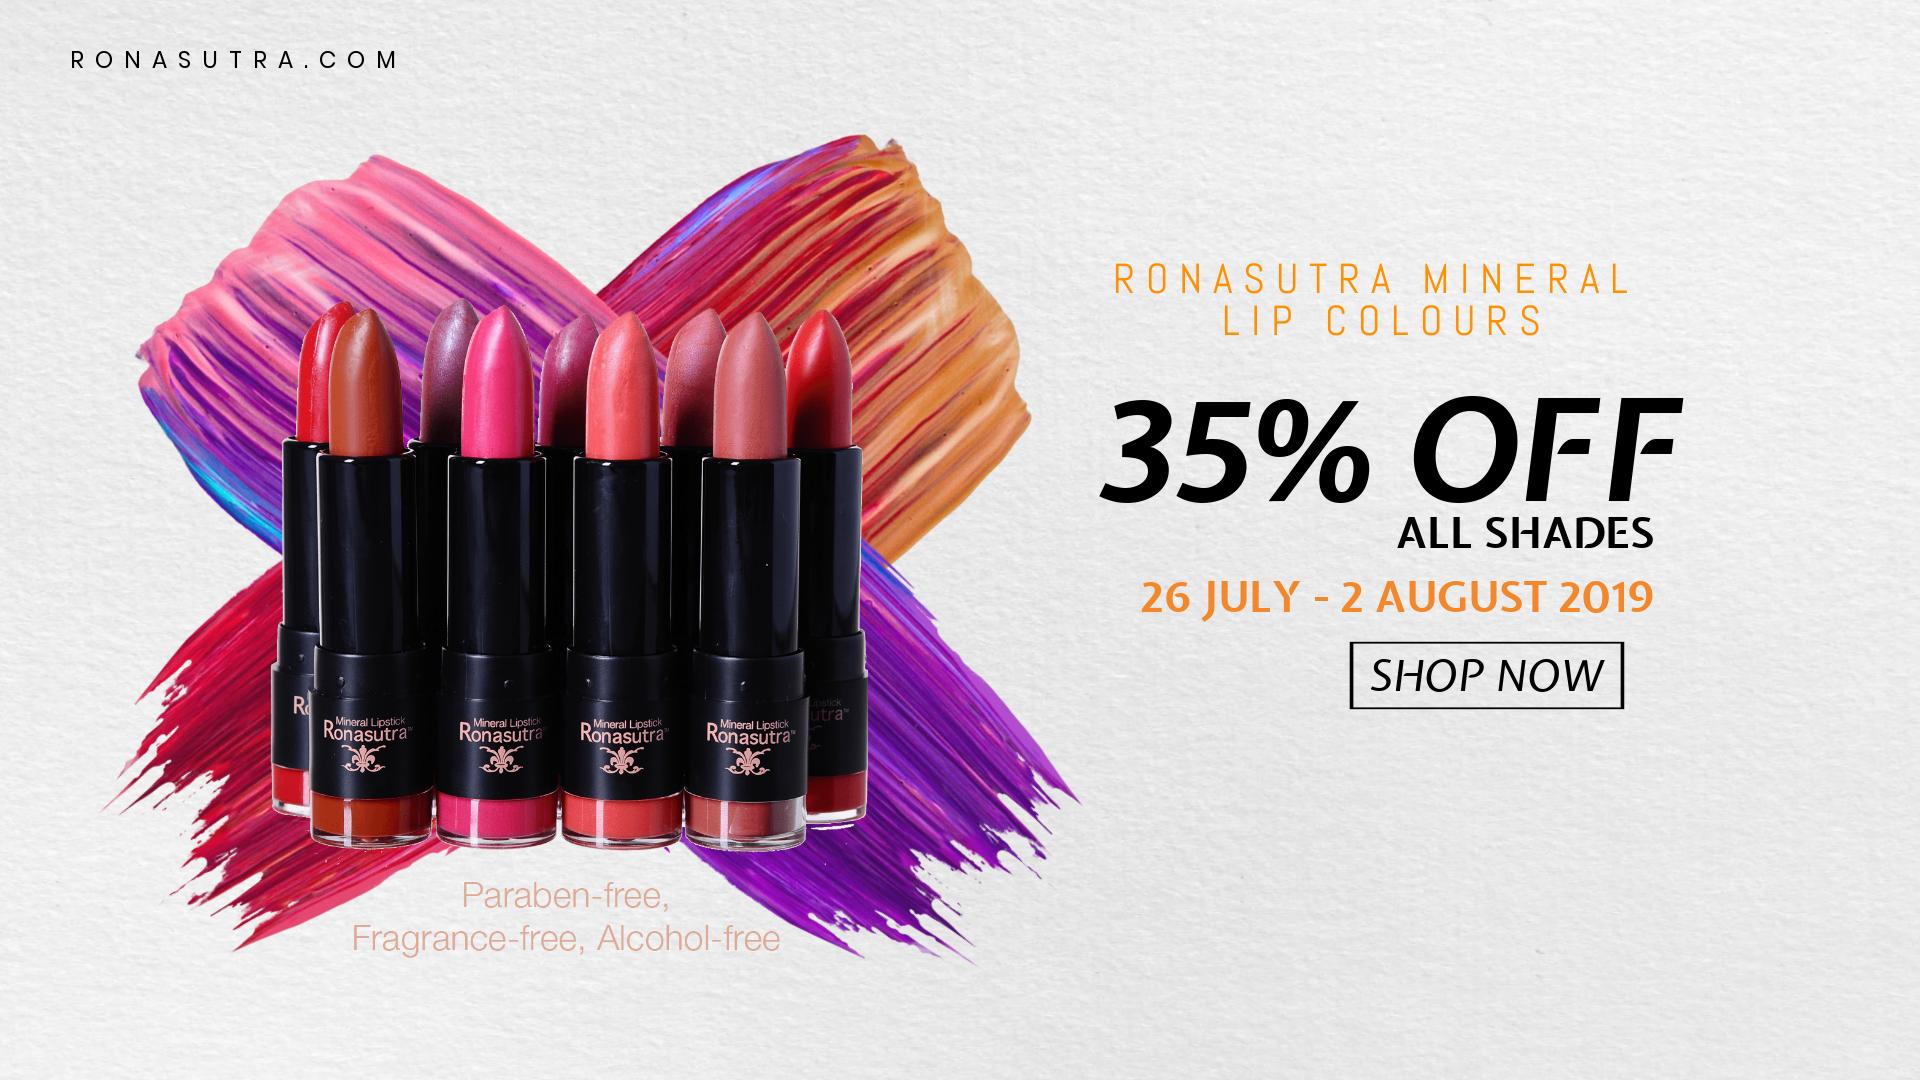 Ronasutra Mineral Lip Colours